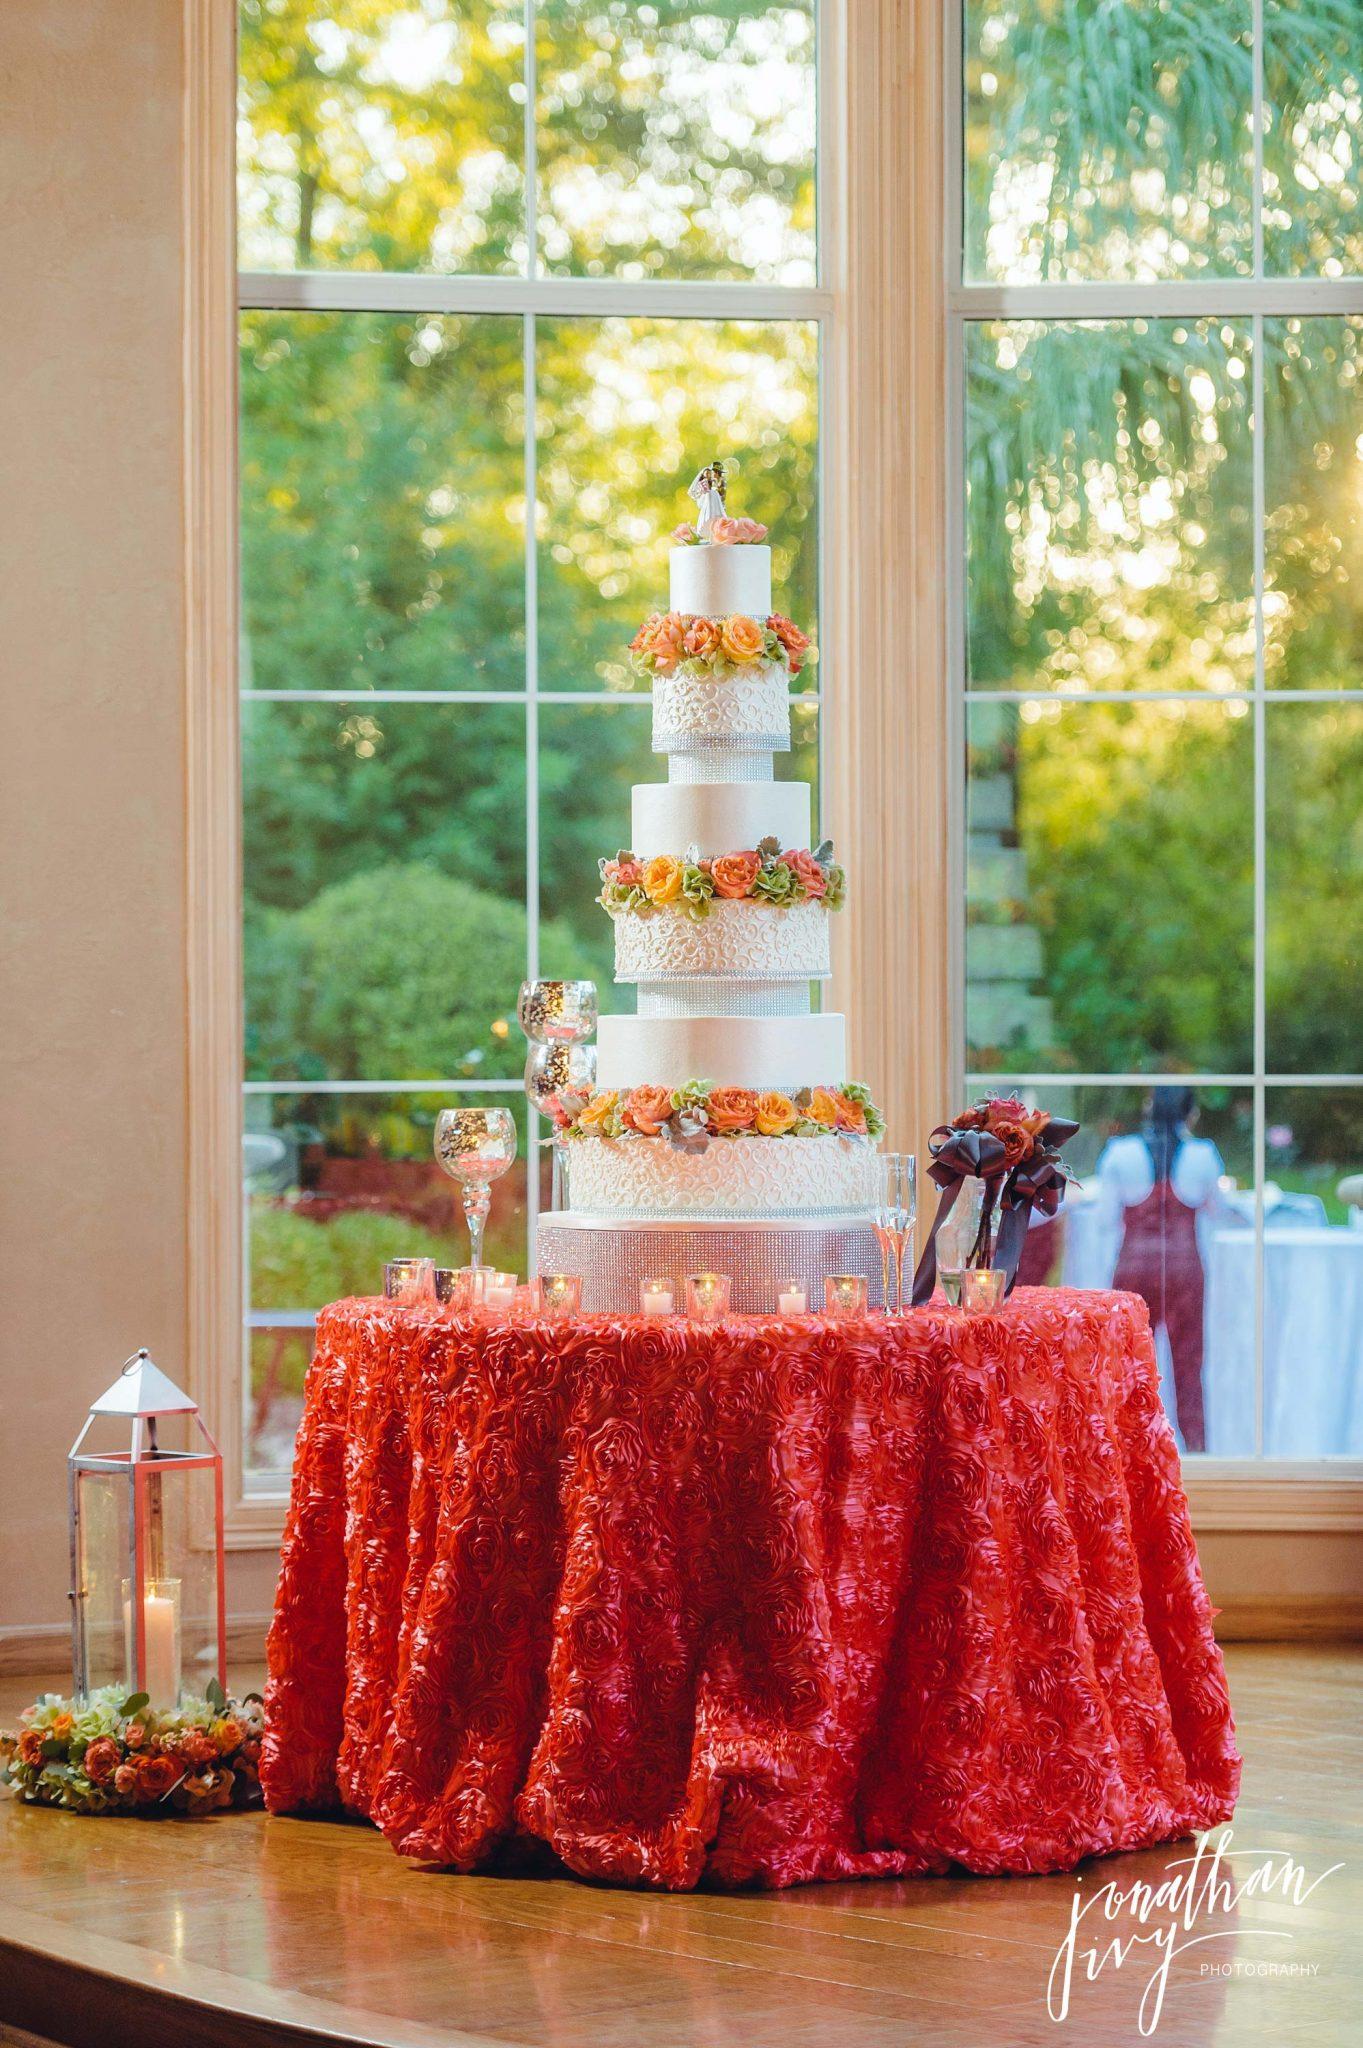 Chateau-polonez-wedding-houston_0033